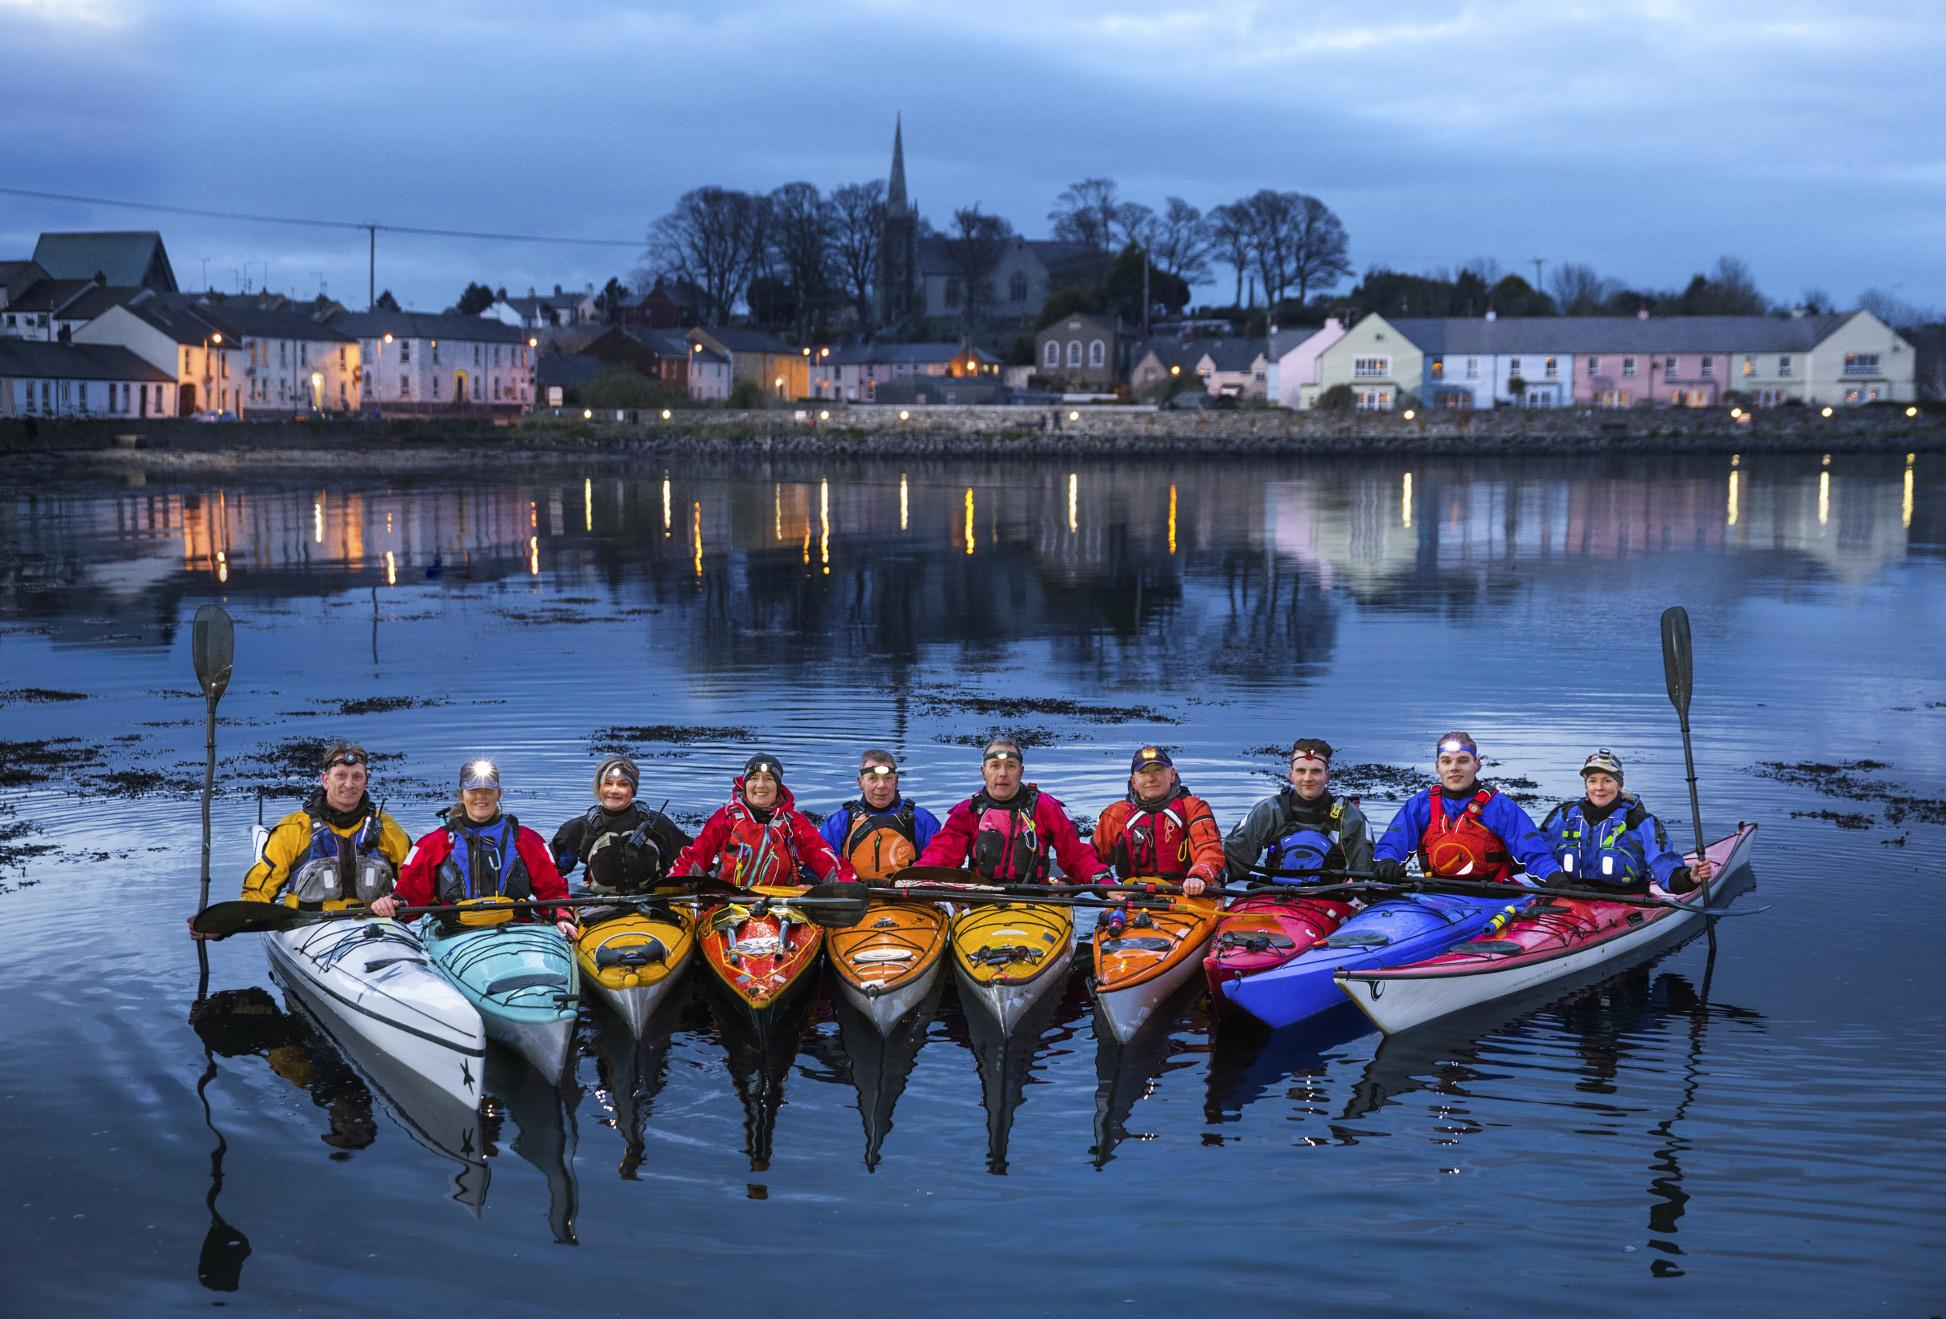 BBC Oneness, Sea Kayakers, Belfast, Photographer: Martin Parr